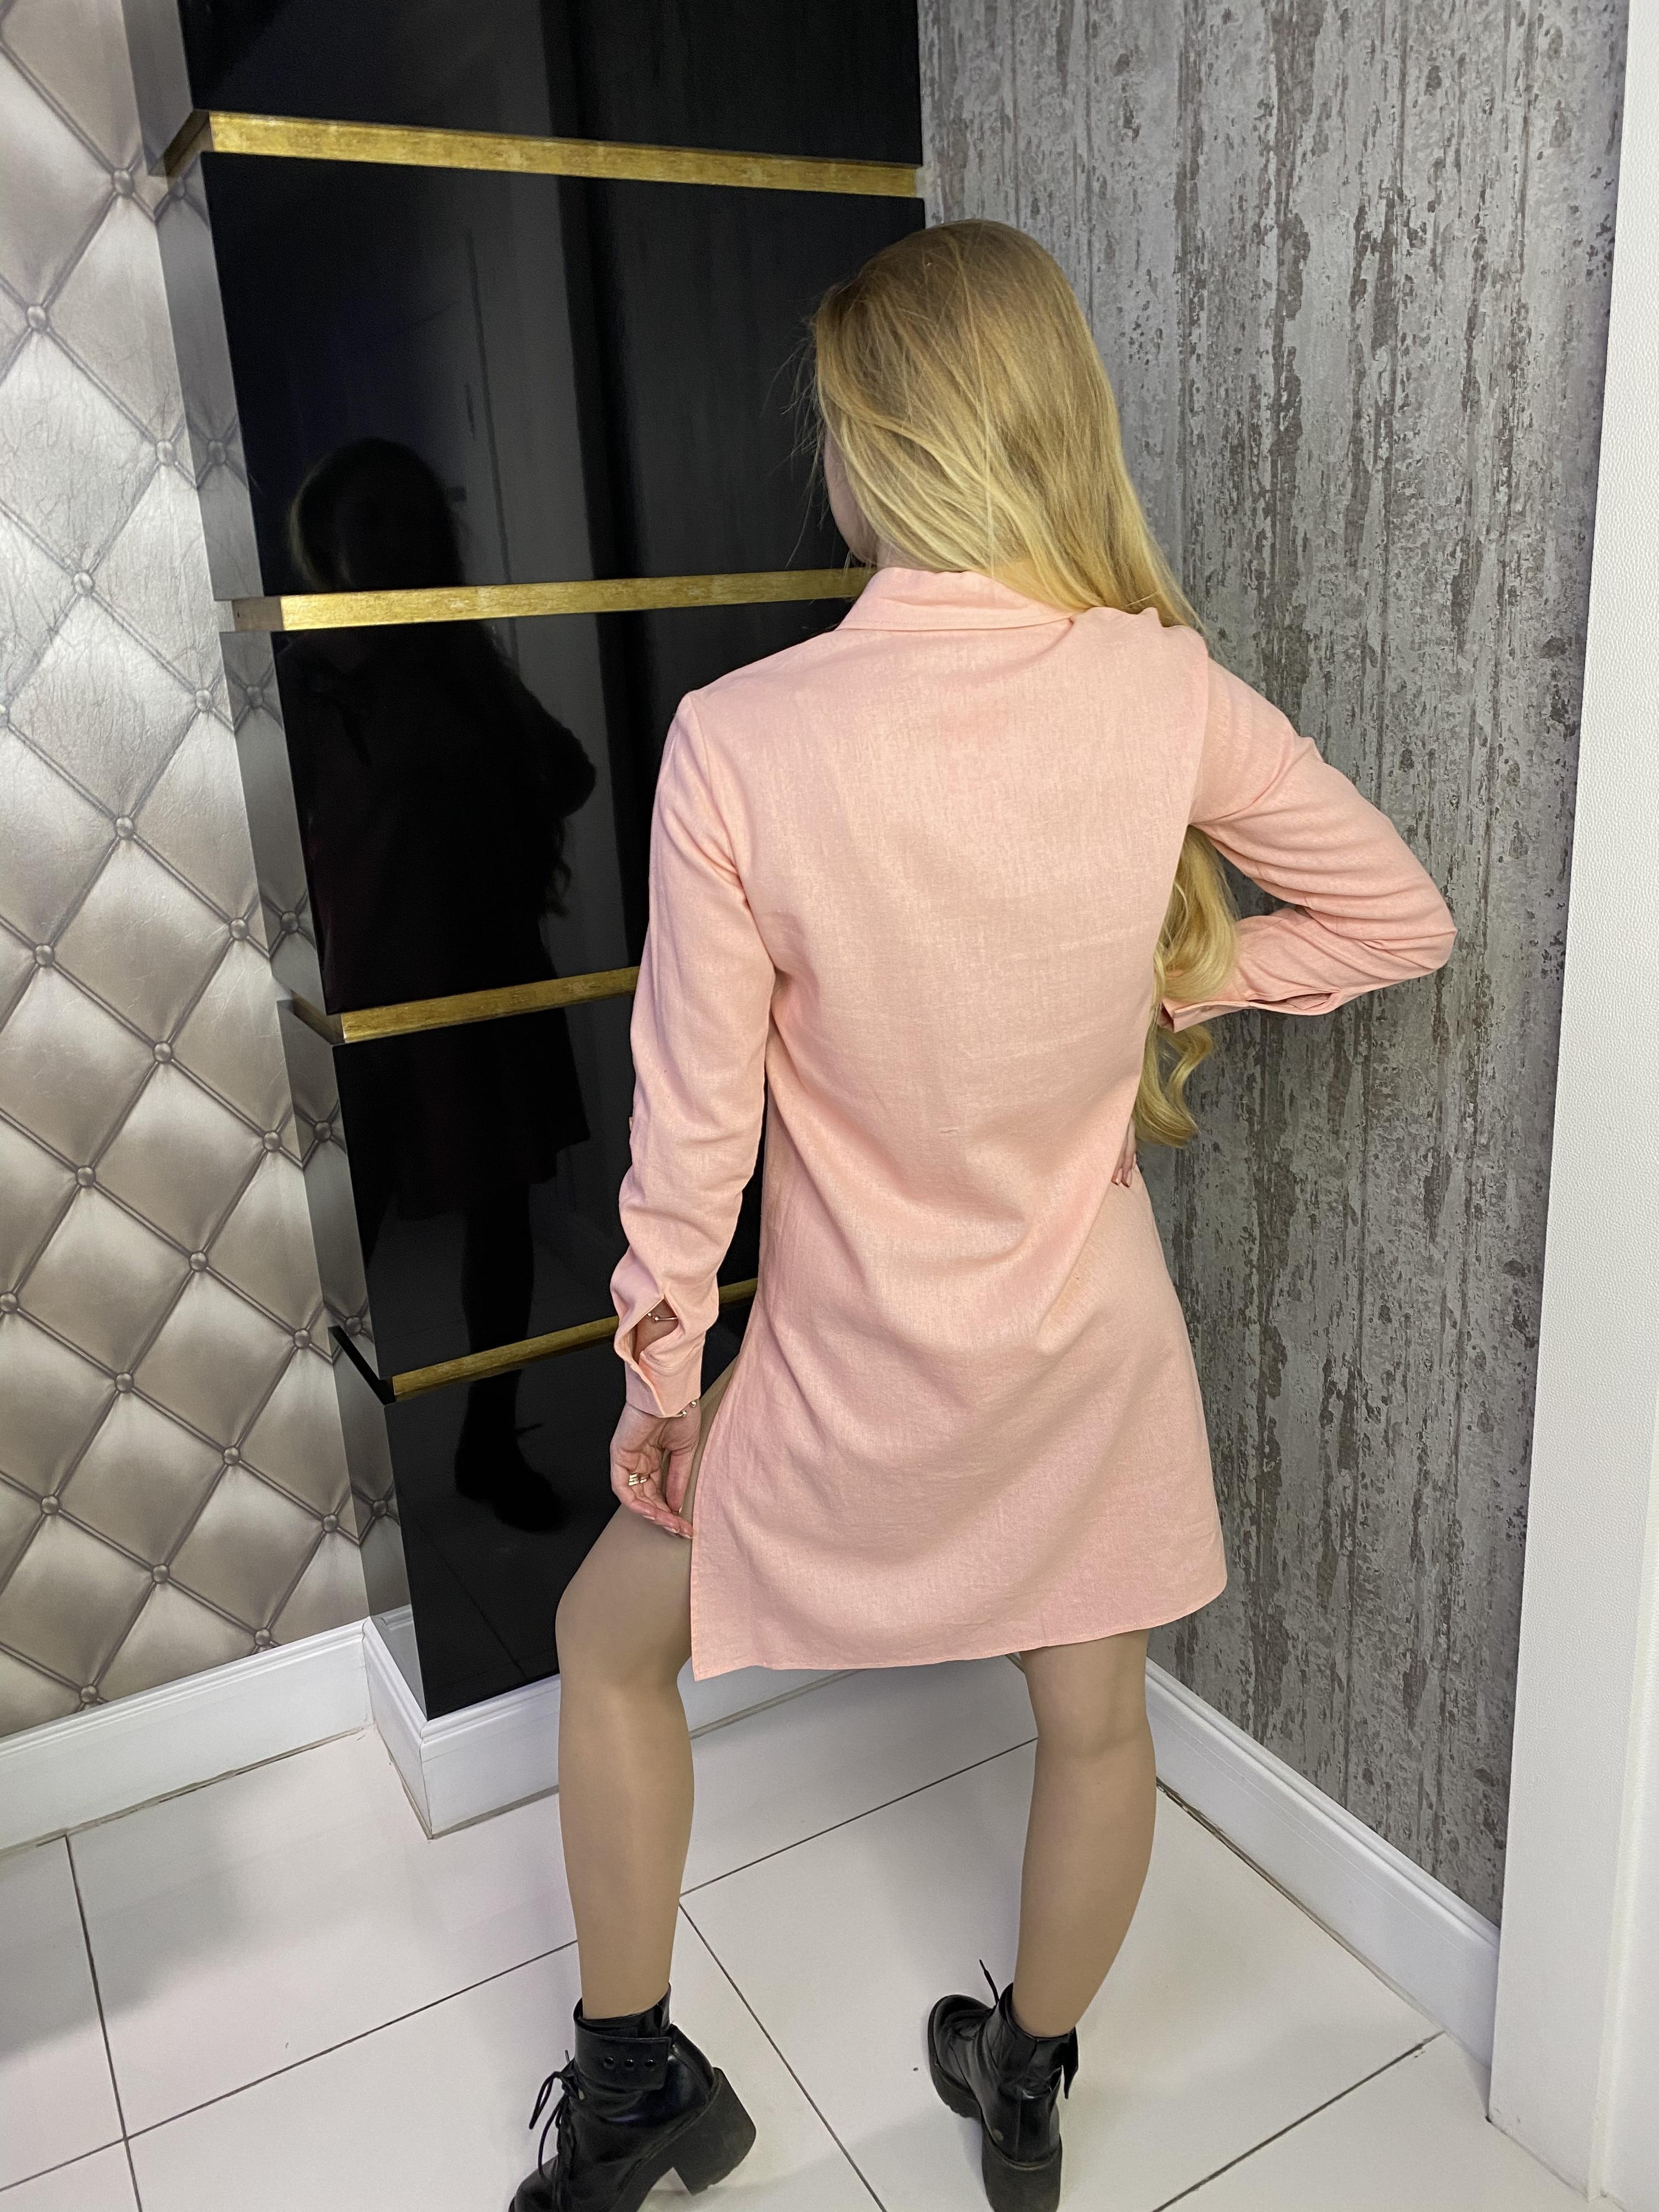 Рубашка Версо лен  АРТ. 14736 Цвет: Персик - фото 2, интернет магазин tm-modus.ru